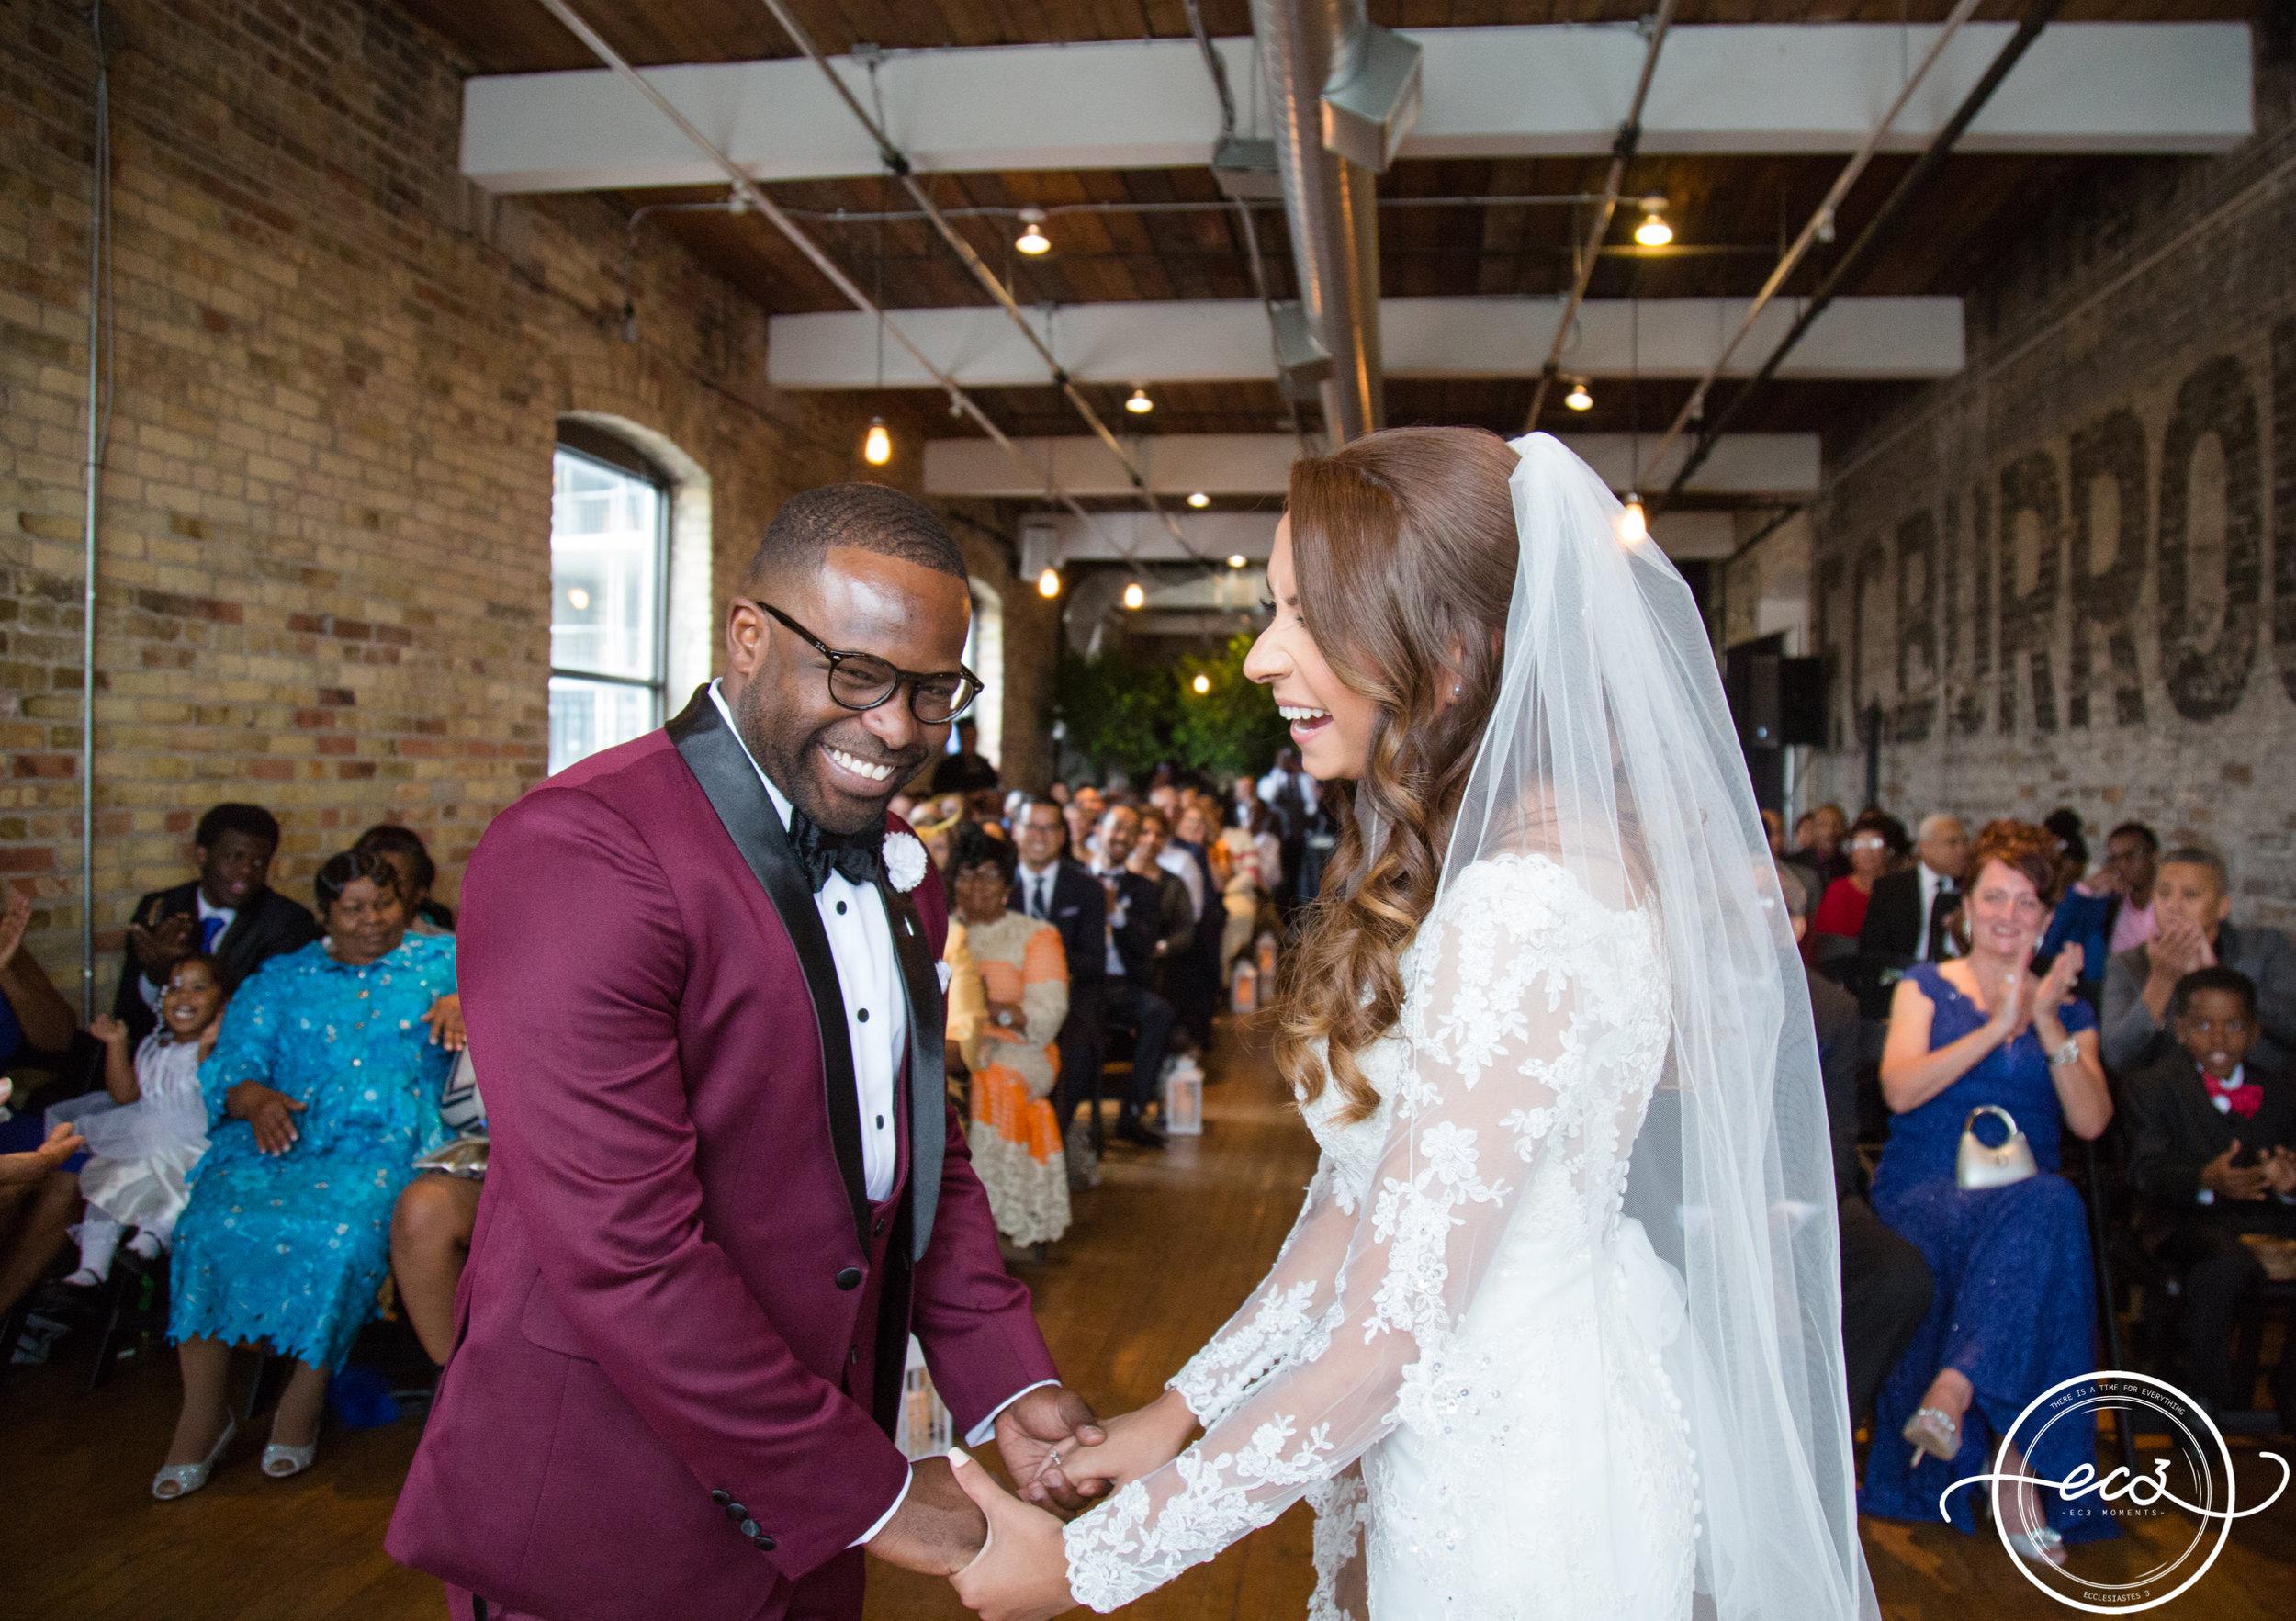 AA-Rustic-Toronto-Burroughes-Wedding24.jpg